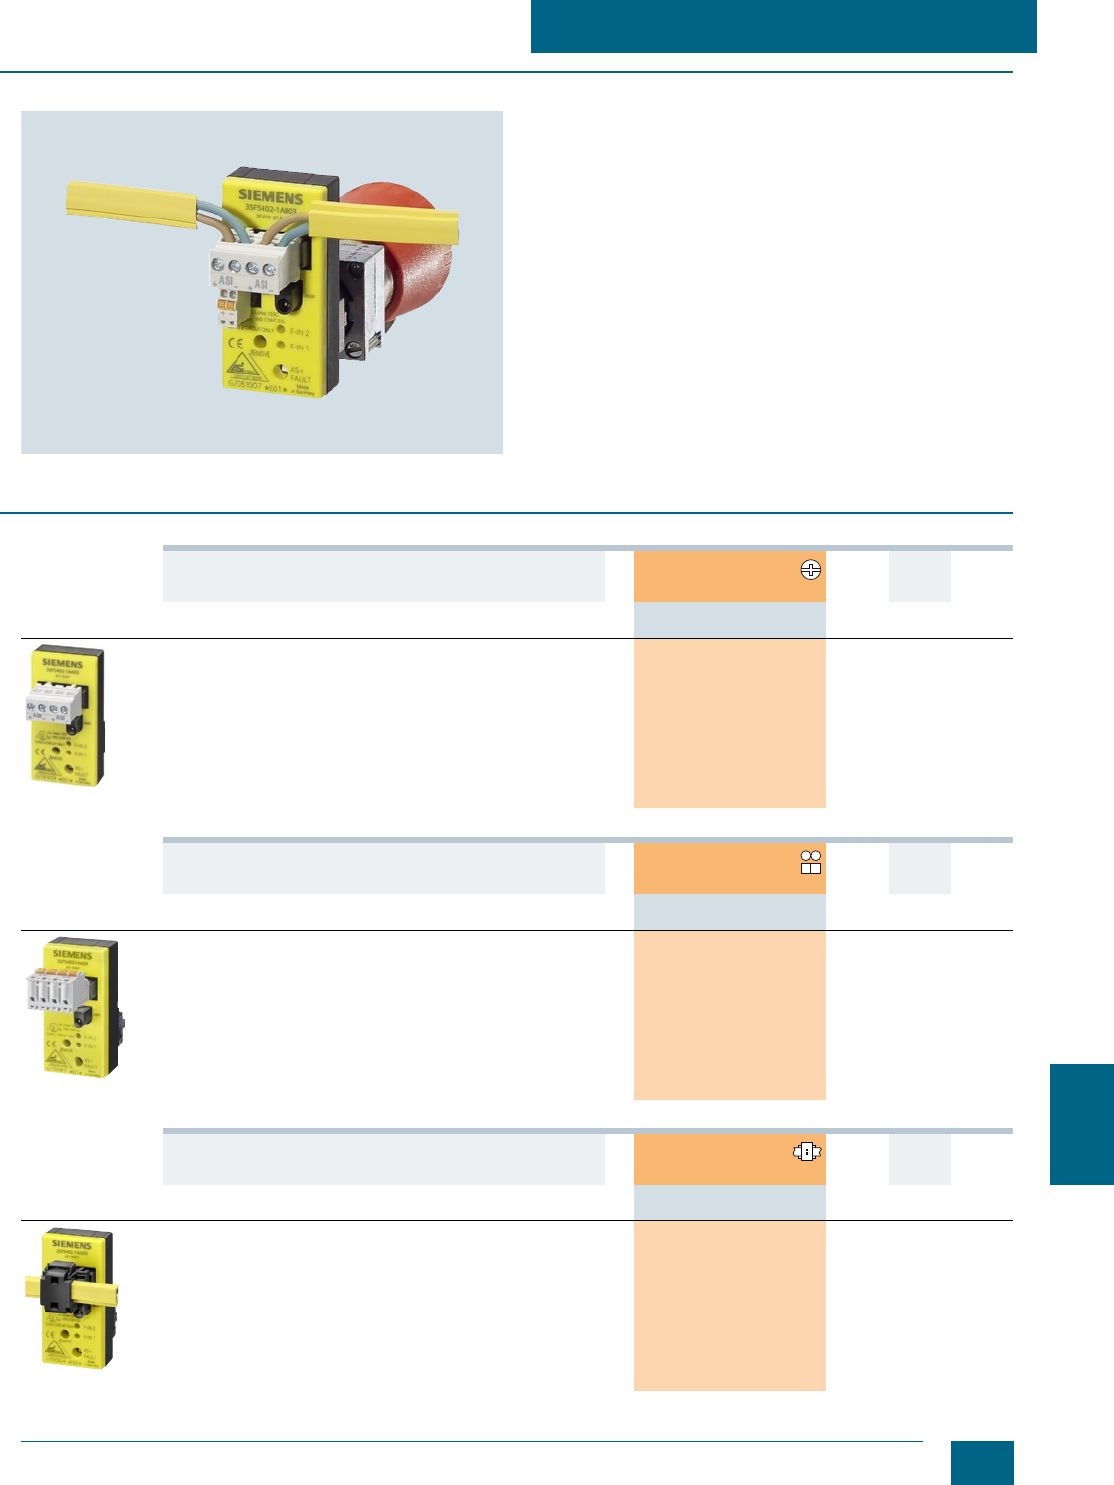 Screw Lens Concentric Rings Yellow Siemens 3SB20 01-6BD06 Indicator Light